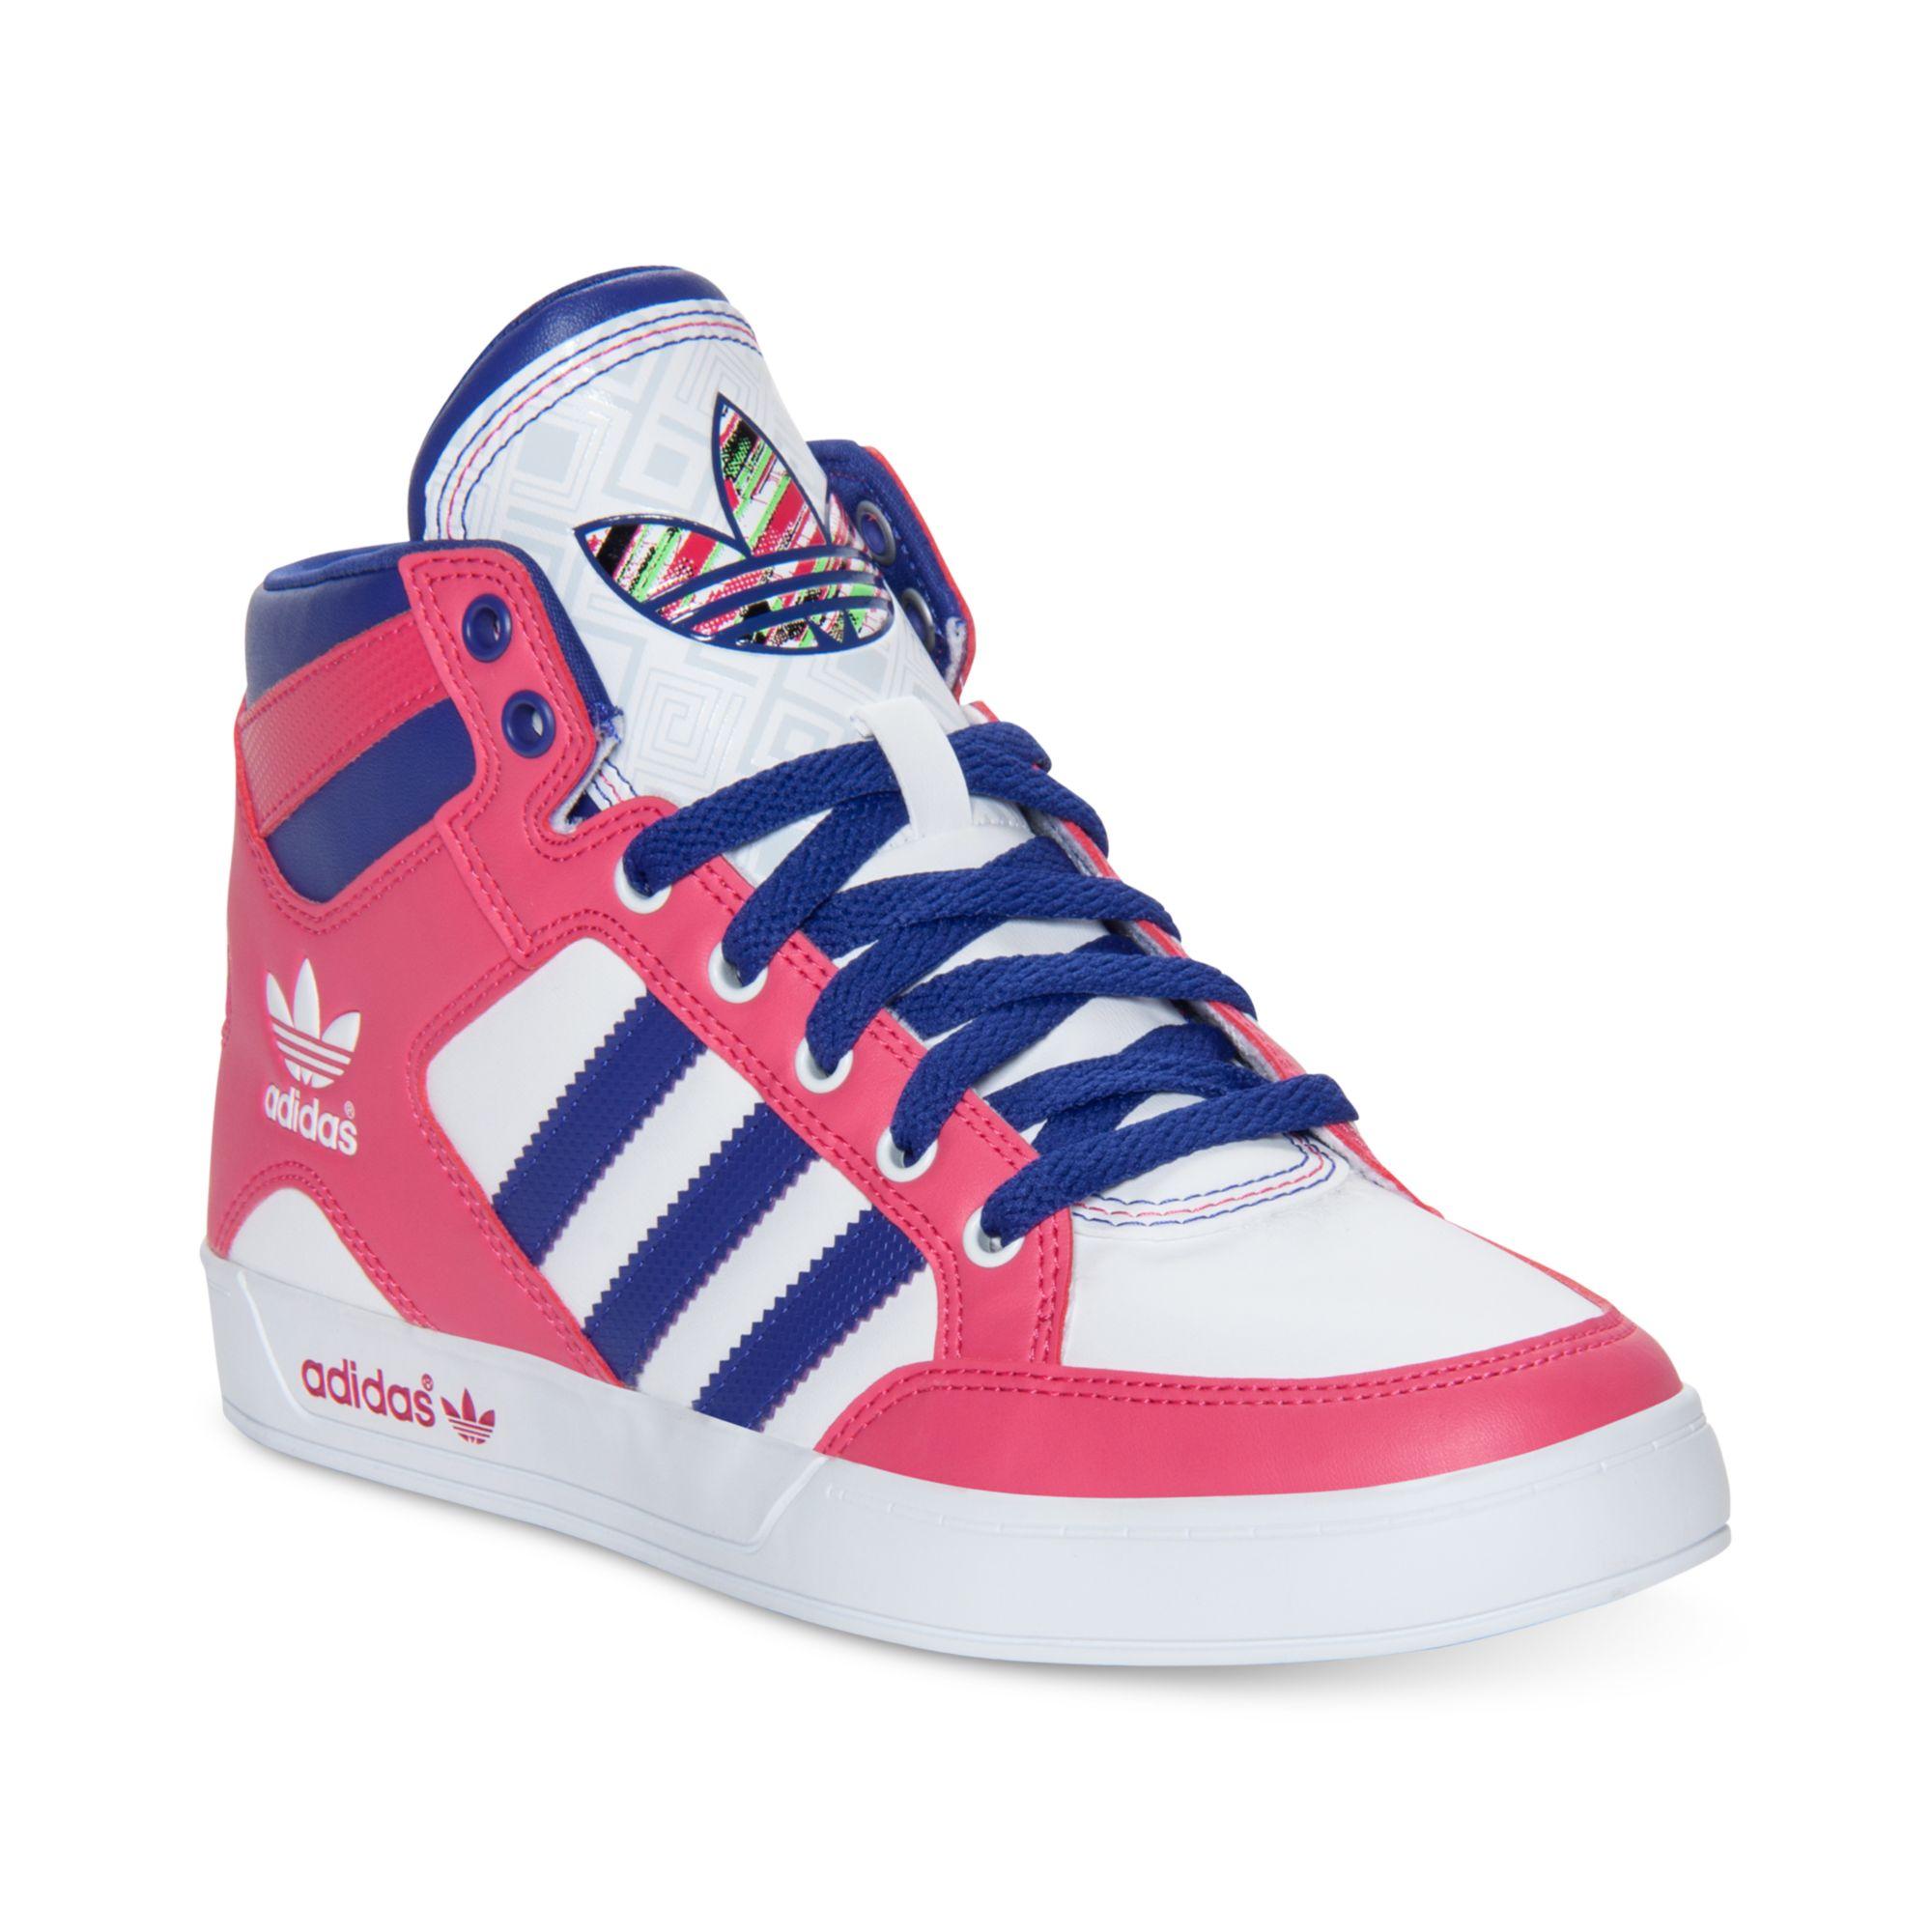 lyst adidas hardcourt ciao casual scarpe rosa